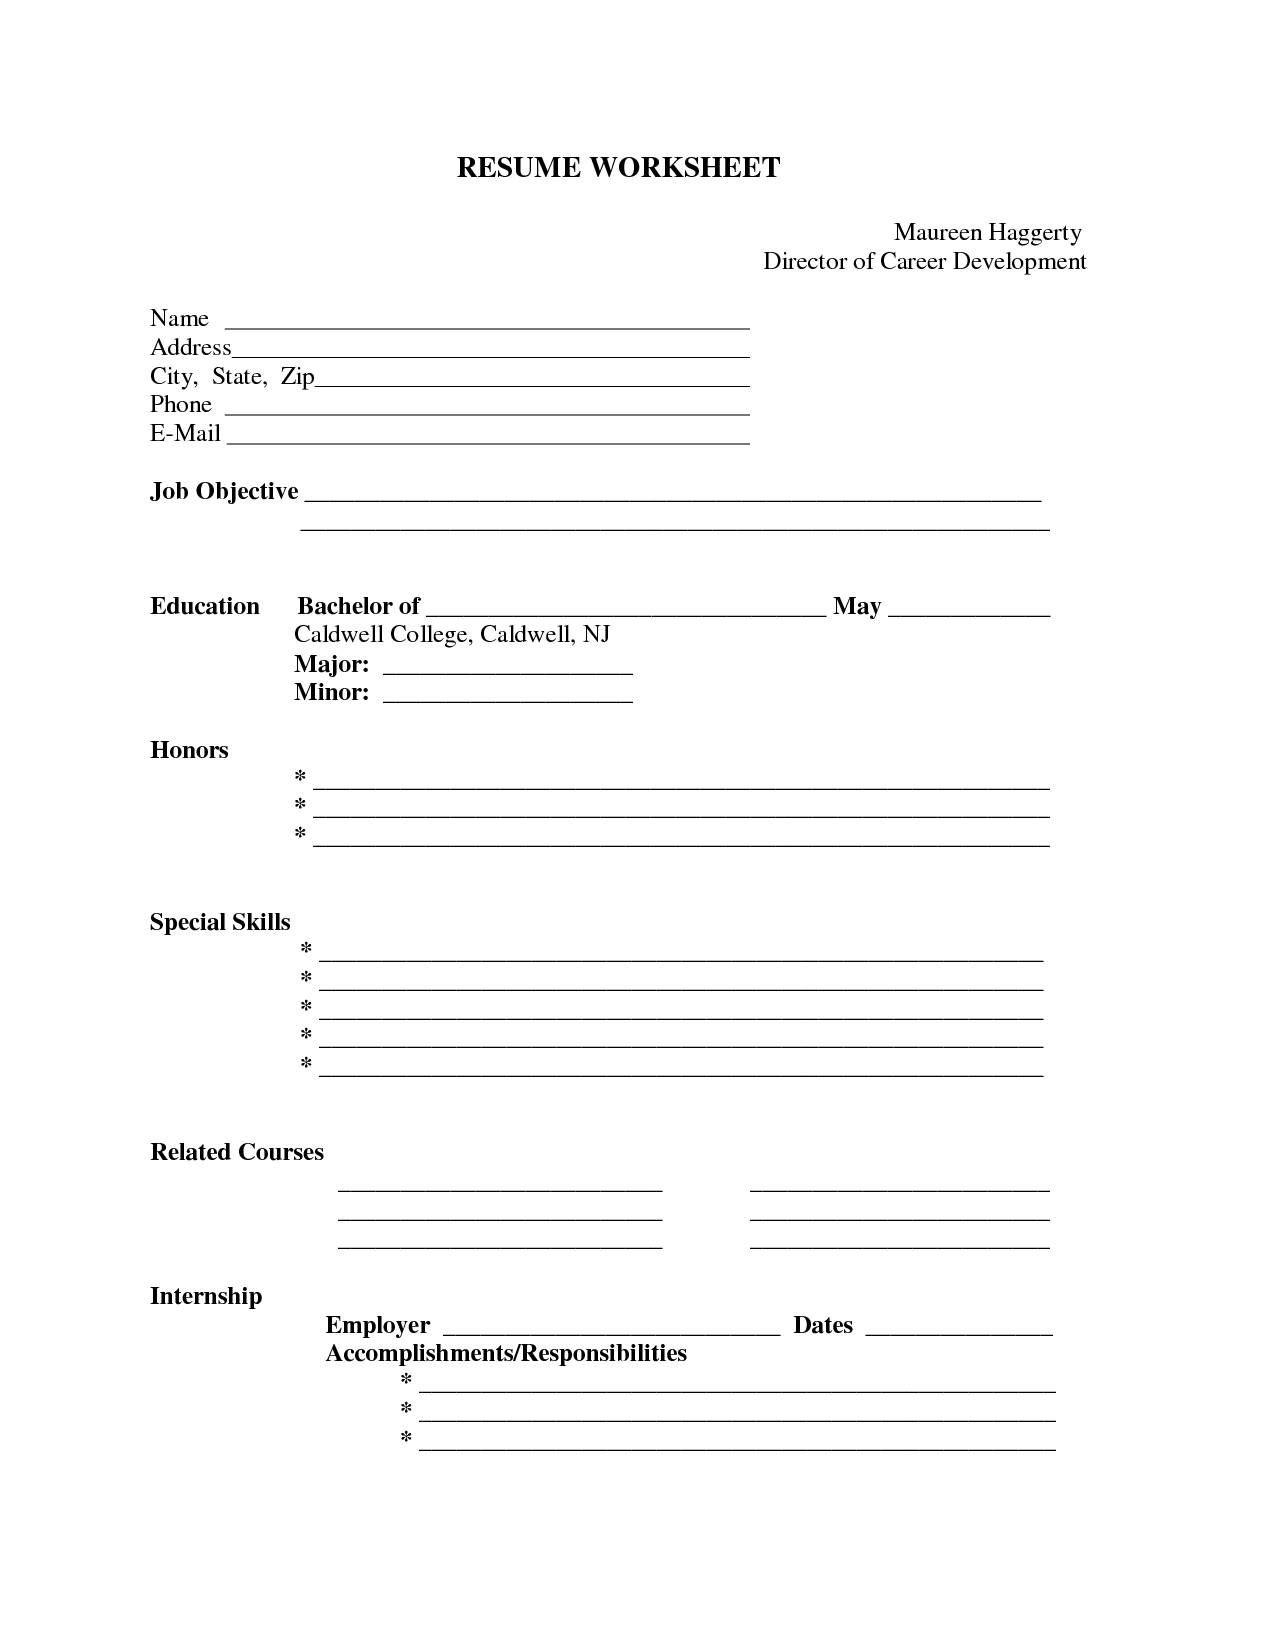 Pinresumejob On Resume Job | Resume Template Free, Free - Free Blank Resume Forms Printable